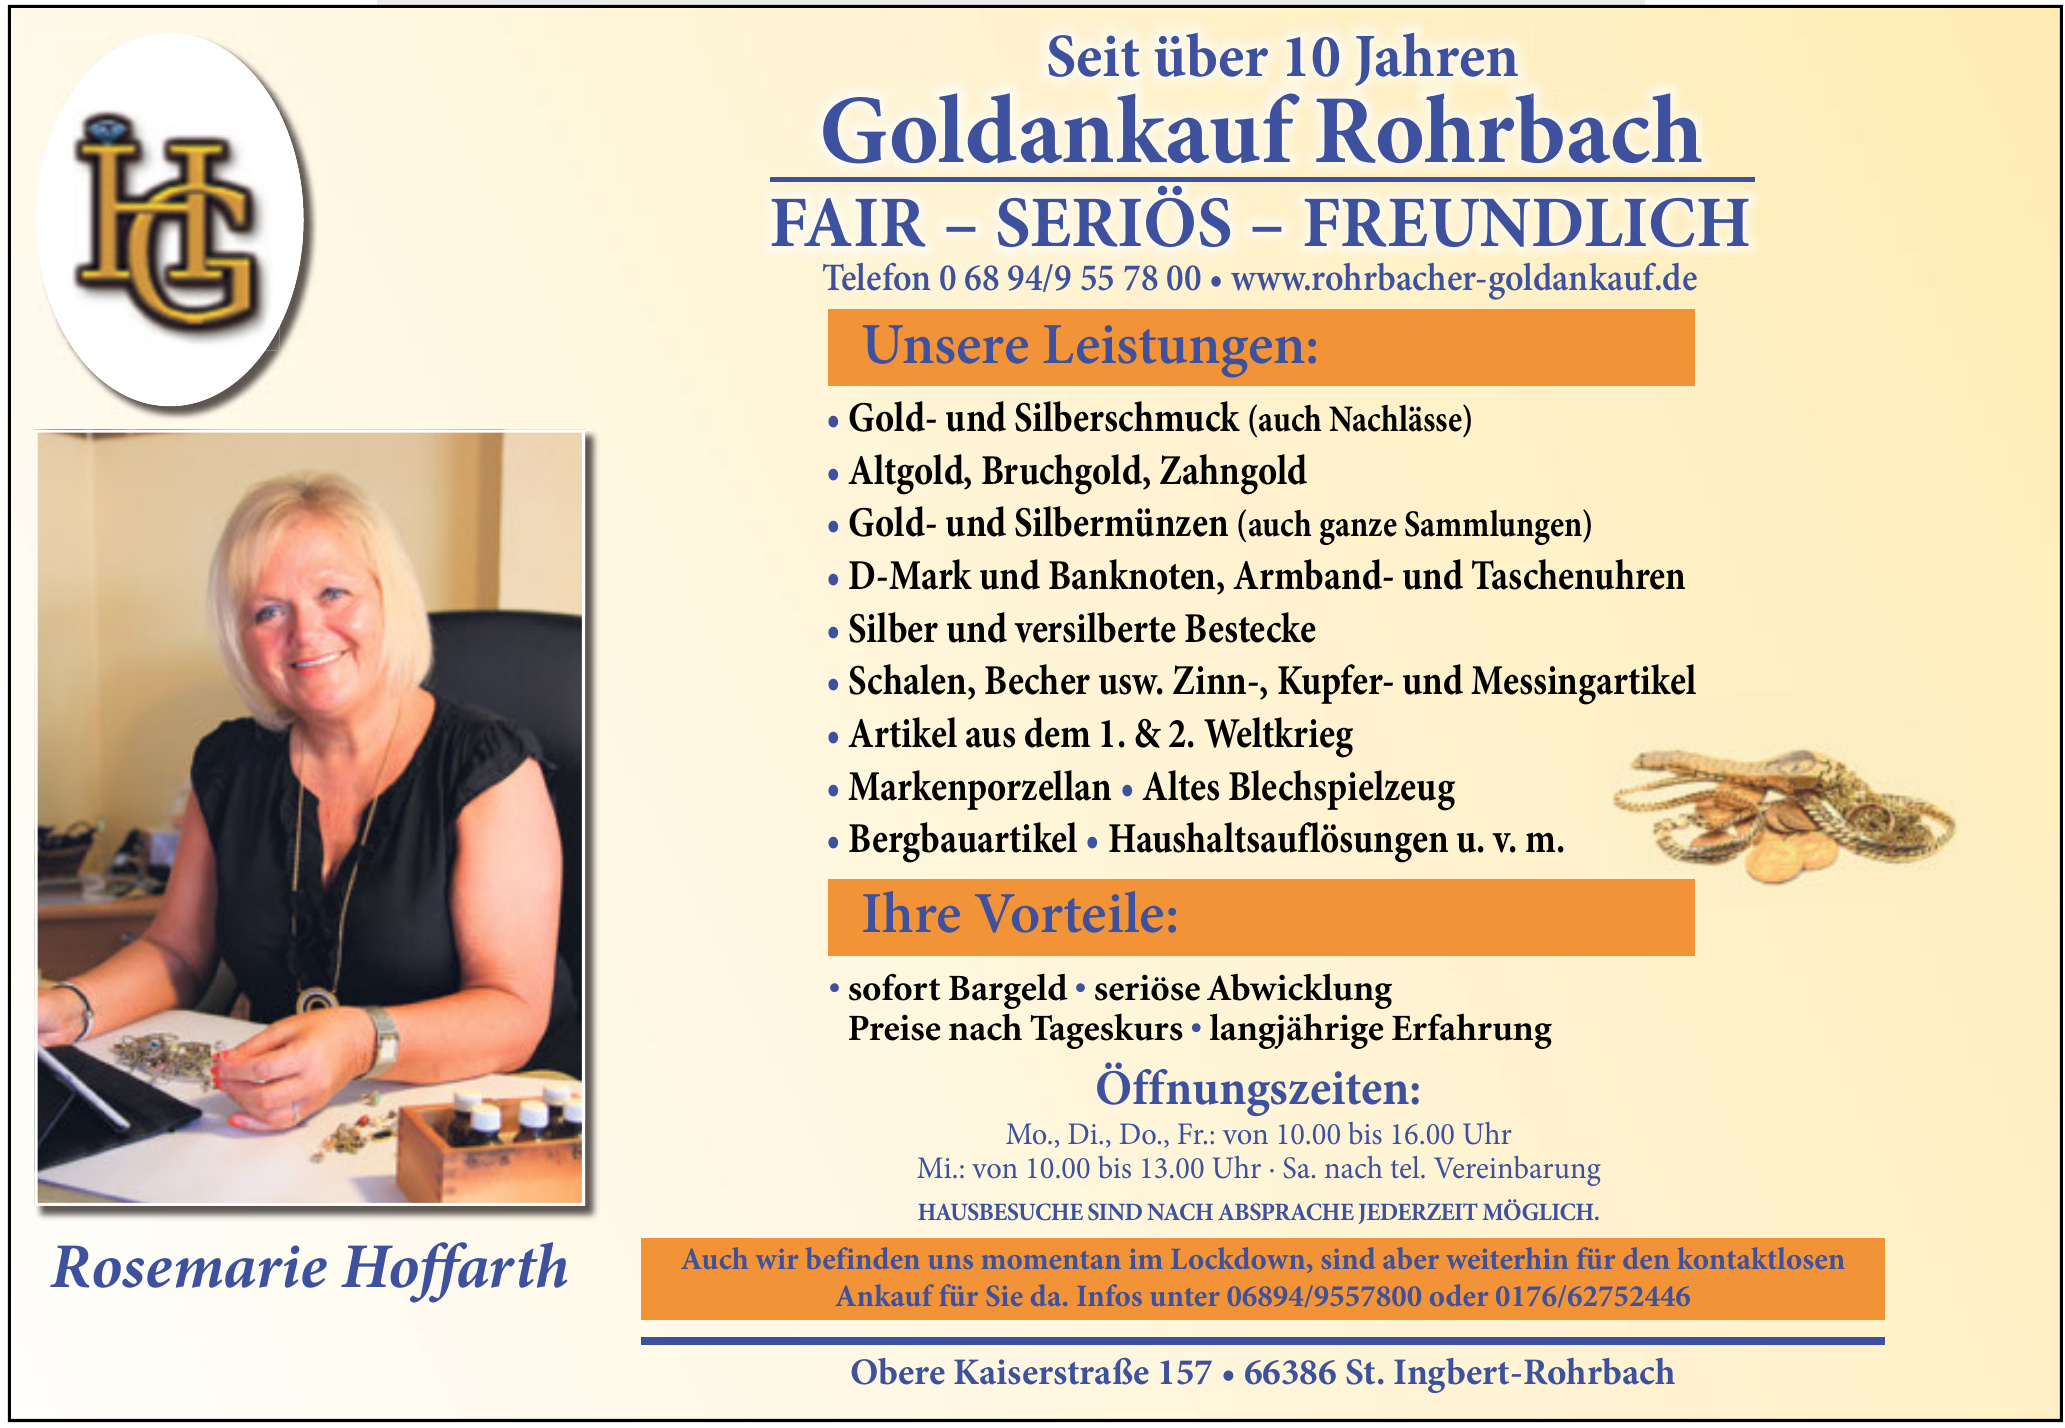 Goldankauf Rohrbach